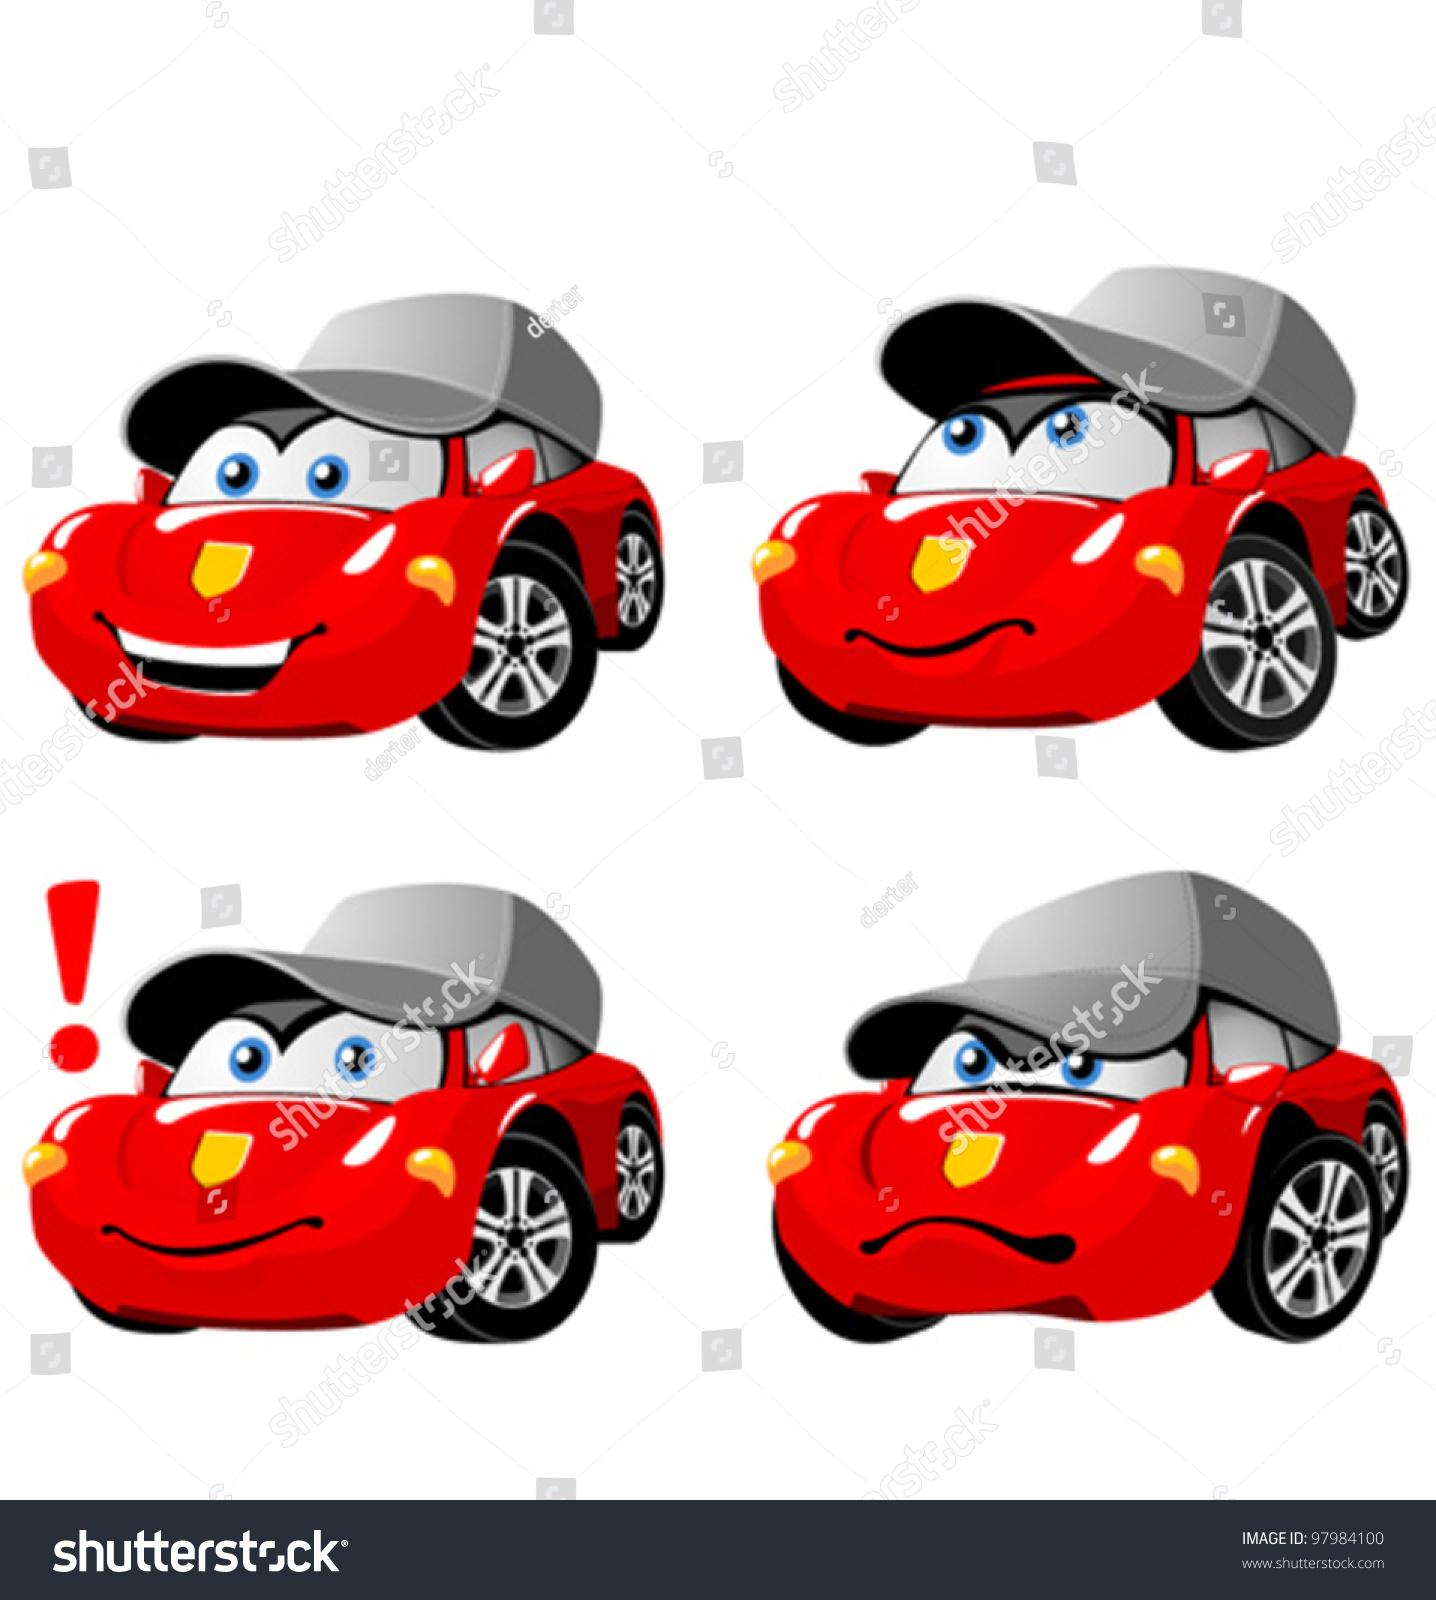 funny cartoon car emotions stock vector 97984100 shutterstock. Black Bedroom Furniture Sets. Home Design Ideas